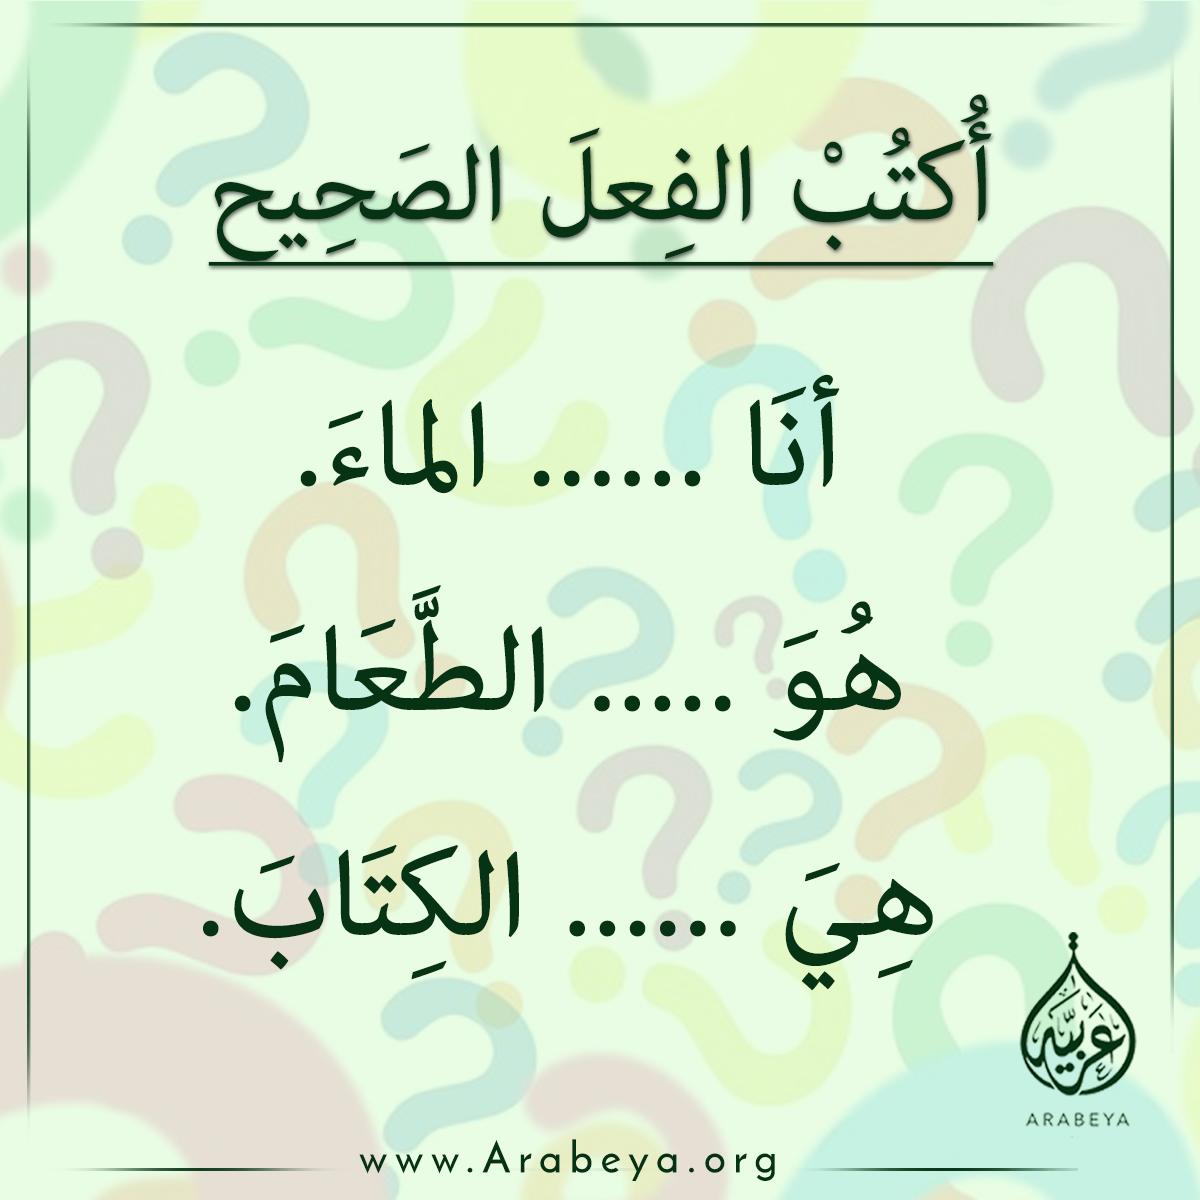 Fill In The Correct Arabic Word Worksheet Arabic Language Learning Arabic Arabic Langauge [ 1200 x 1200 Pixel ]